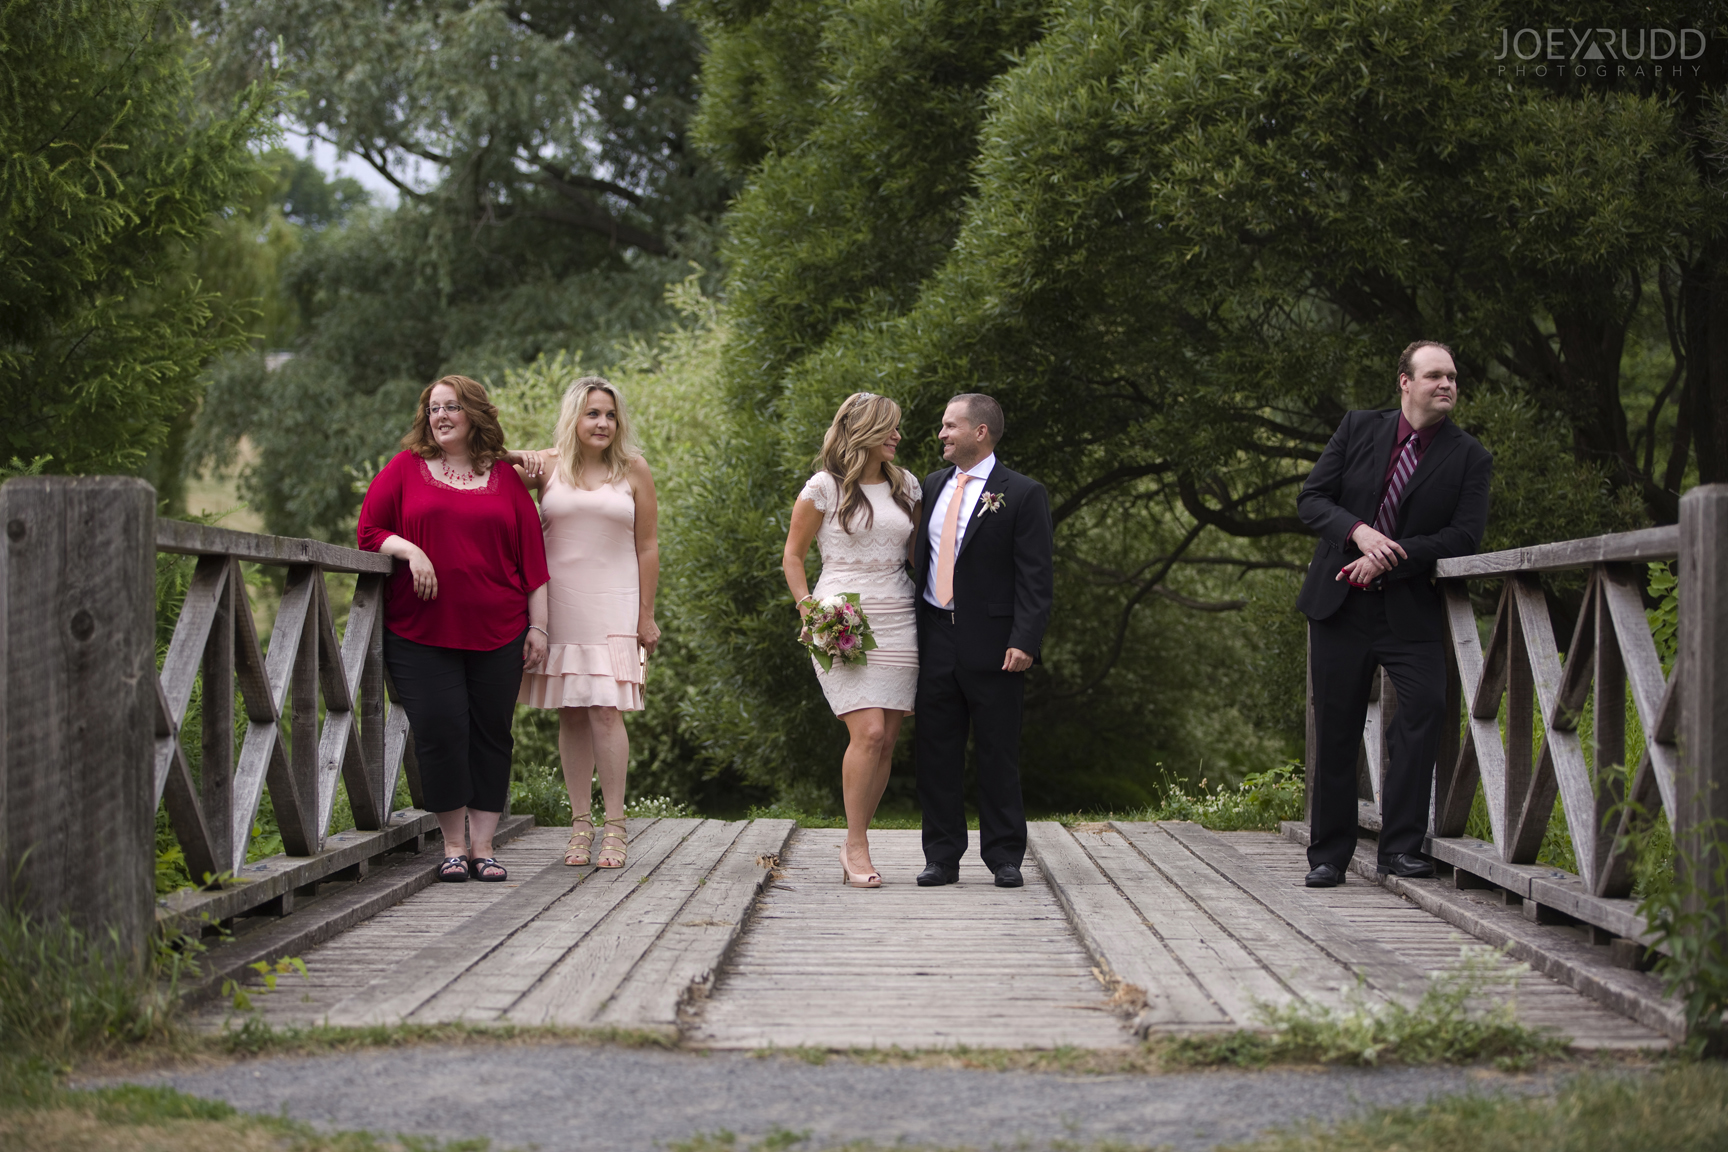 Elopement Wedding by Ottawa Wedding Photographer Joey Rudd Photography Arboretum Wedding Party